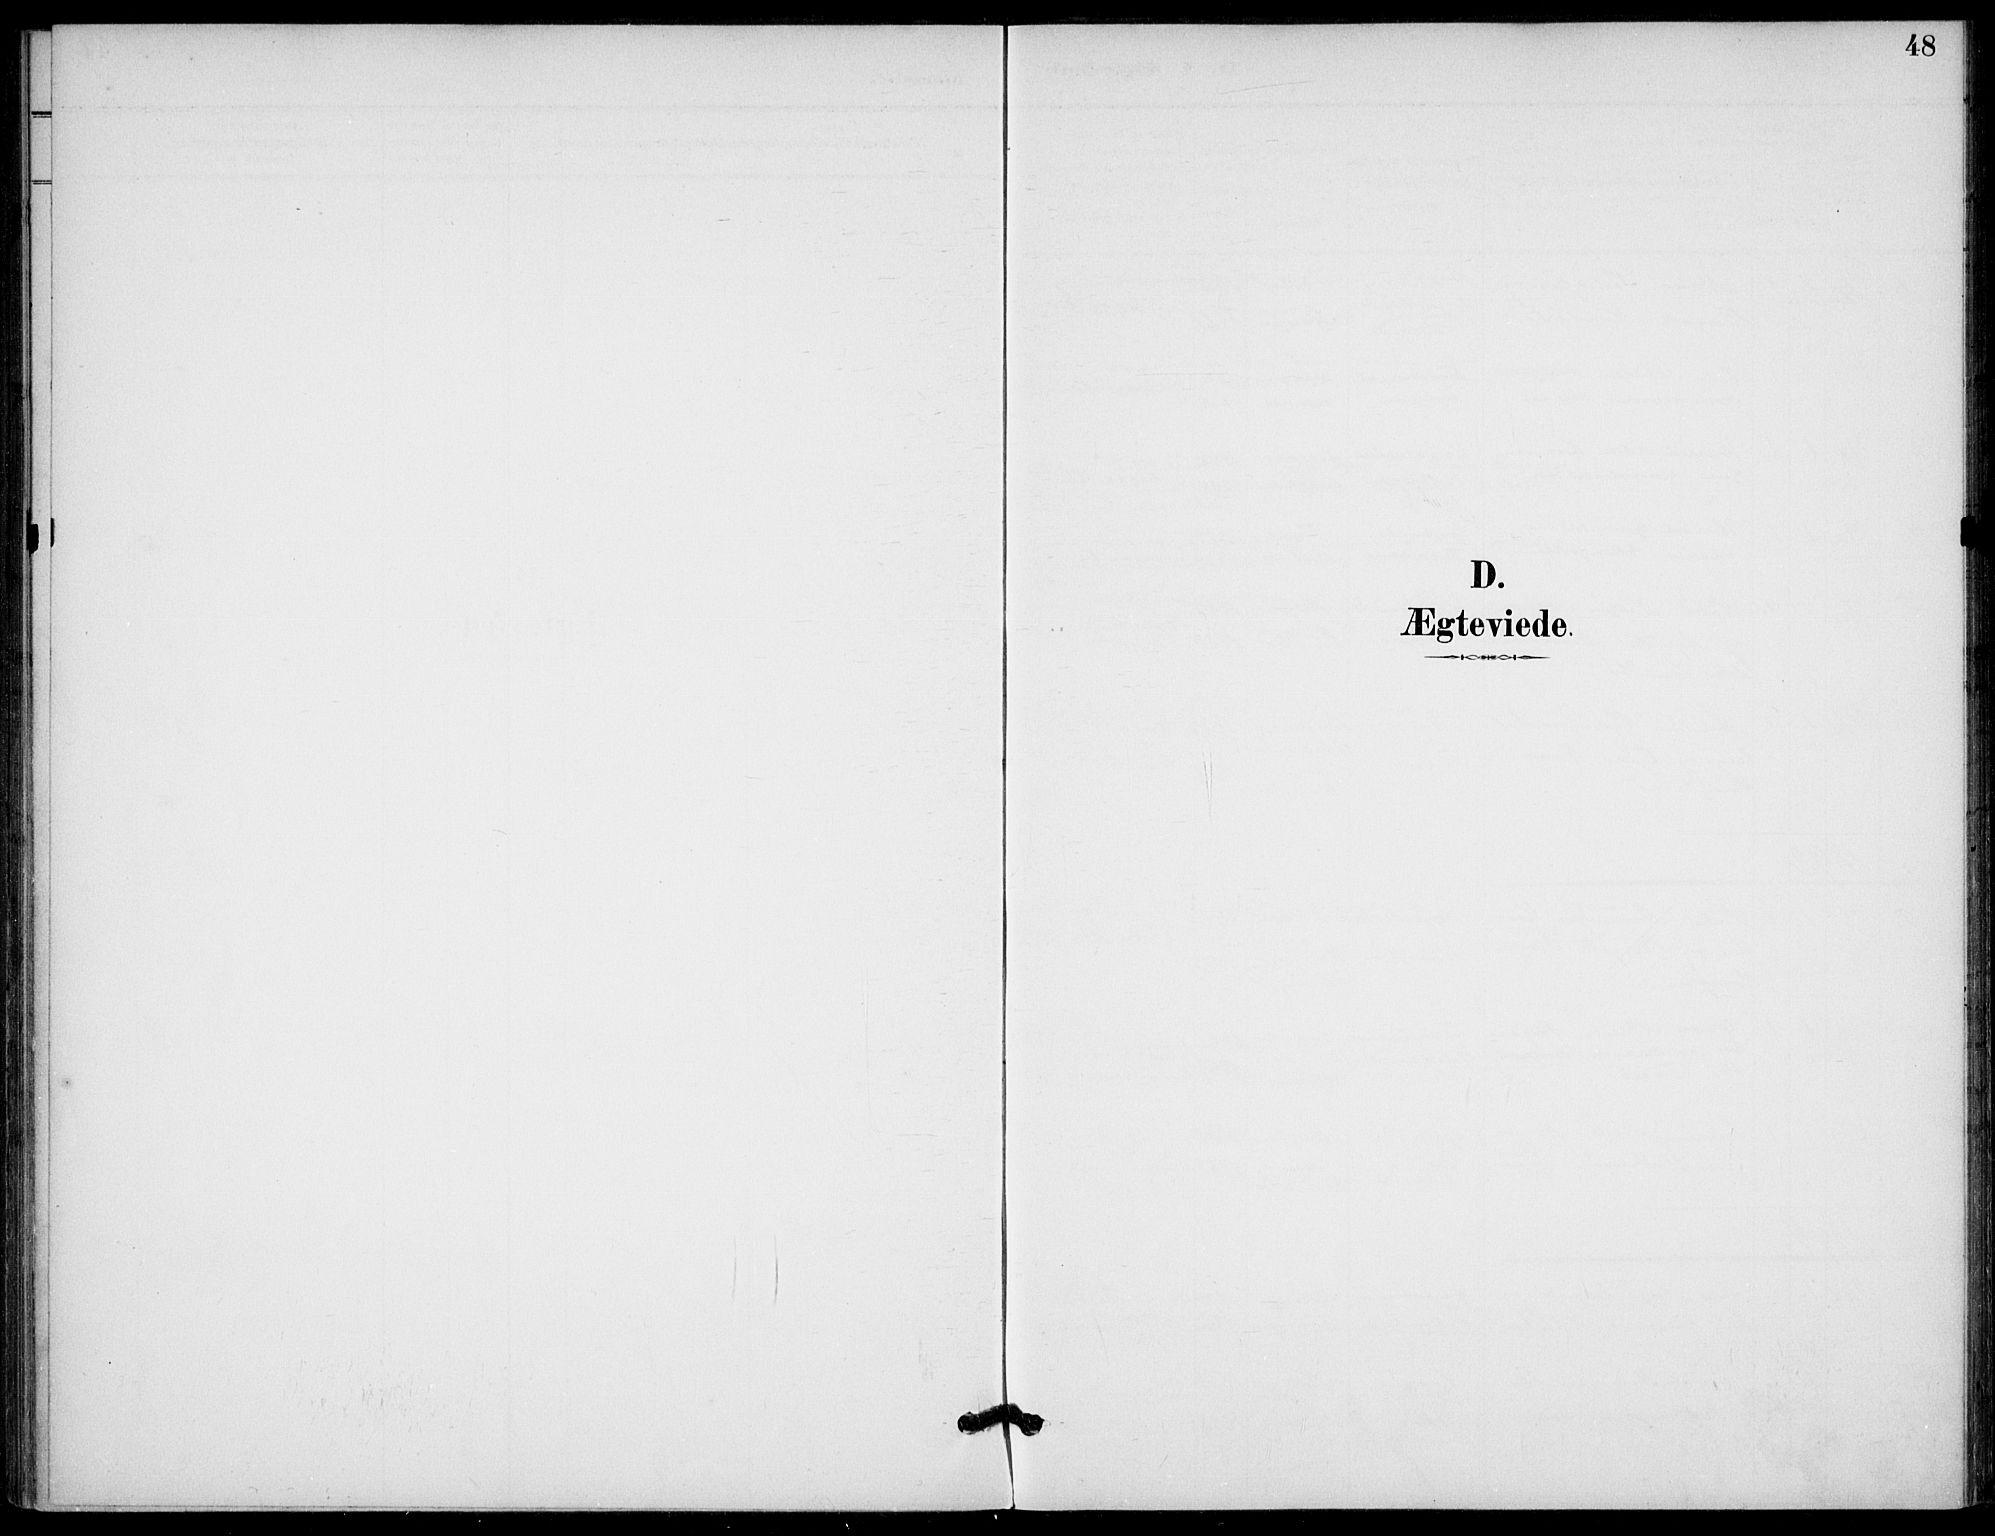 SAKO, Lunde kirkebøker, F/Fb/L0004: Ministerialbok nr. II 4, 1892-1907, s. 48